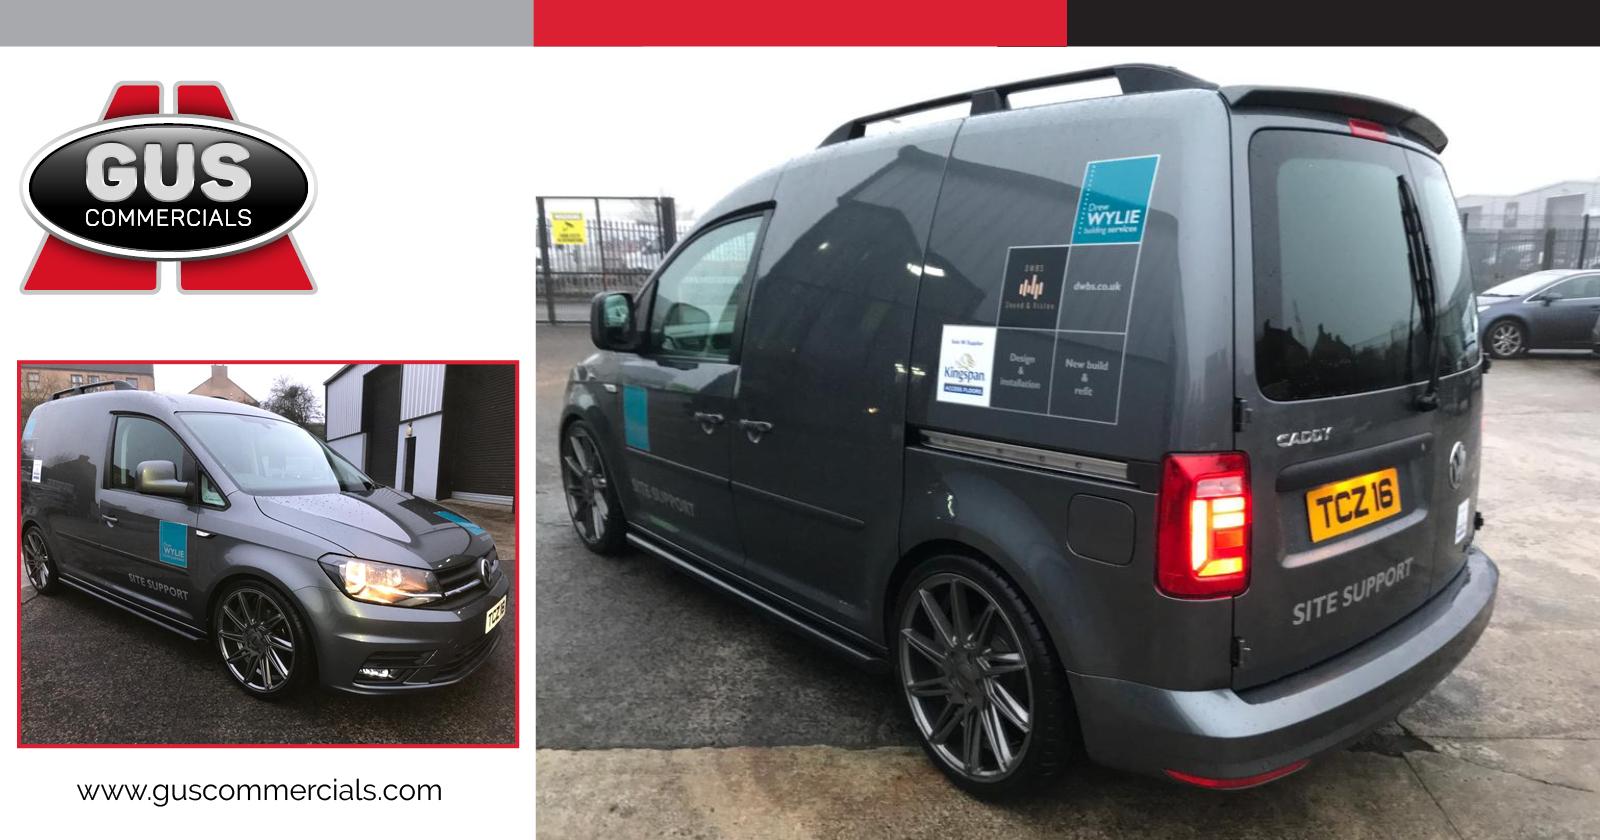 Drew Wylie Building Services VW Caddy van